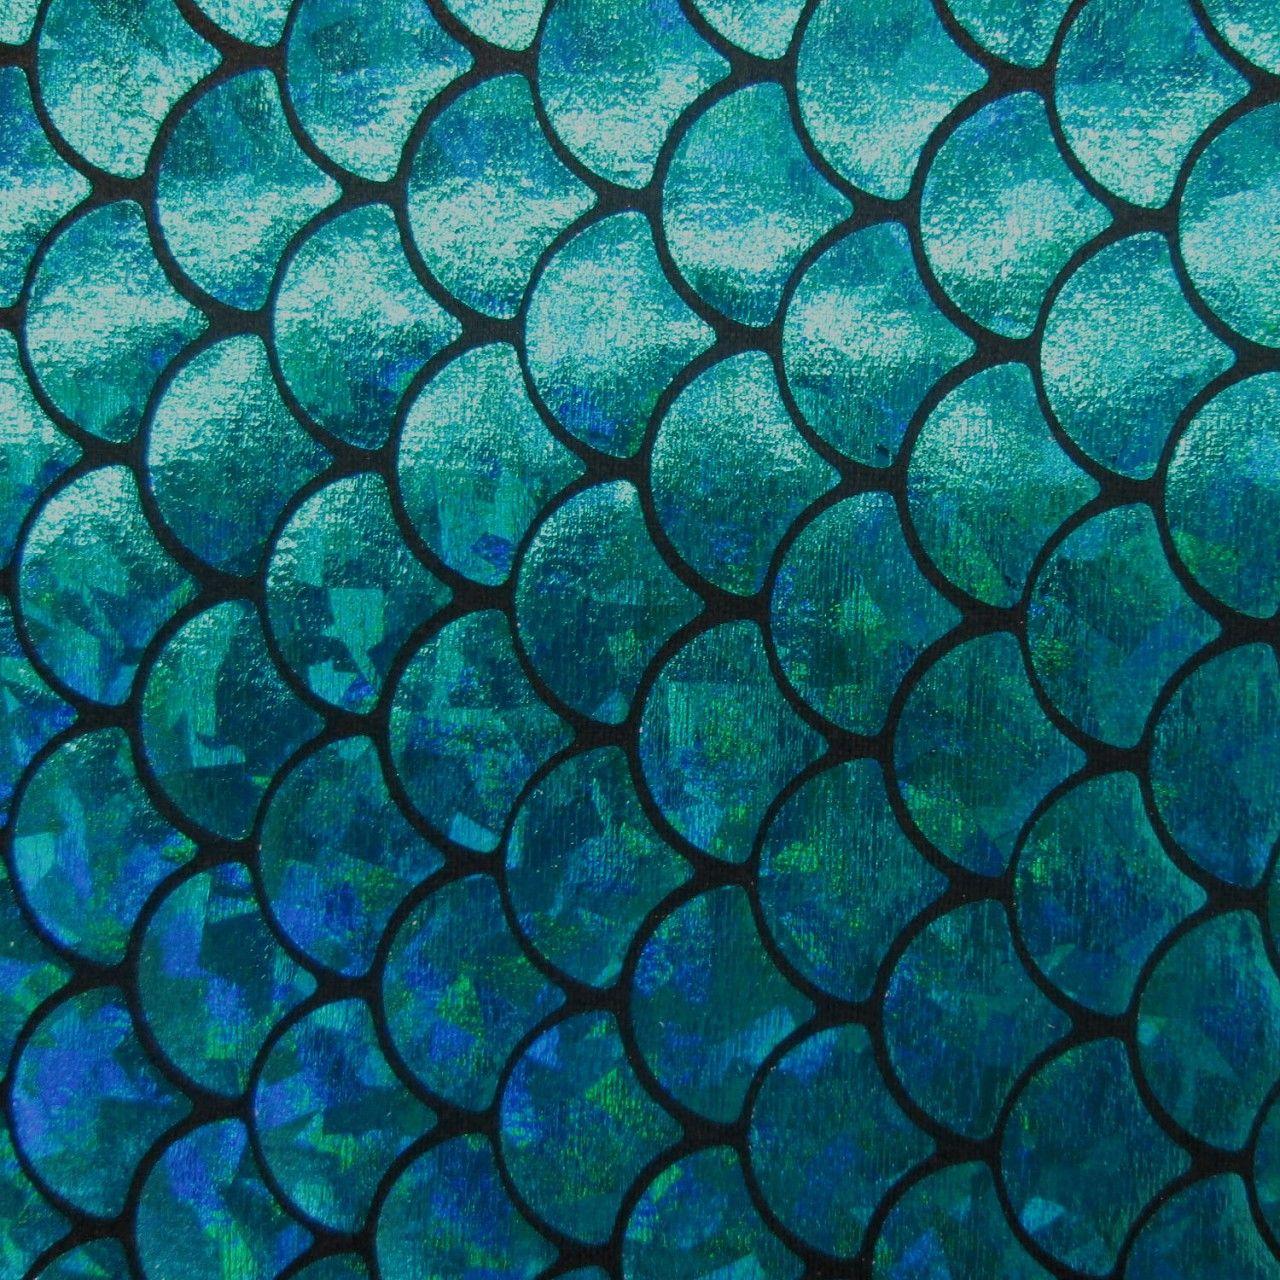 mermaid scale pattern - Google Search | Referências | Pinterest ...